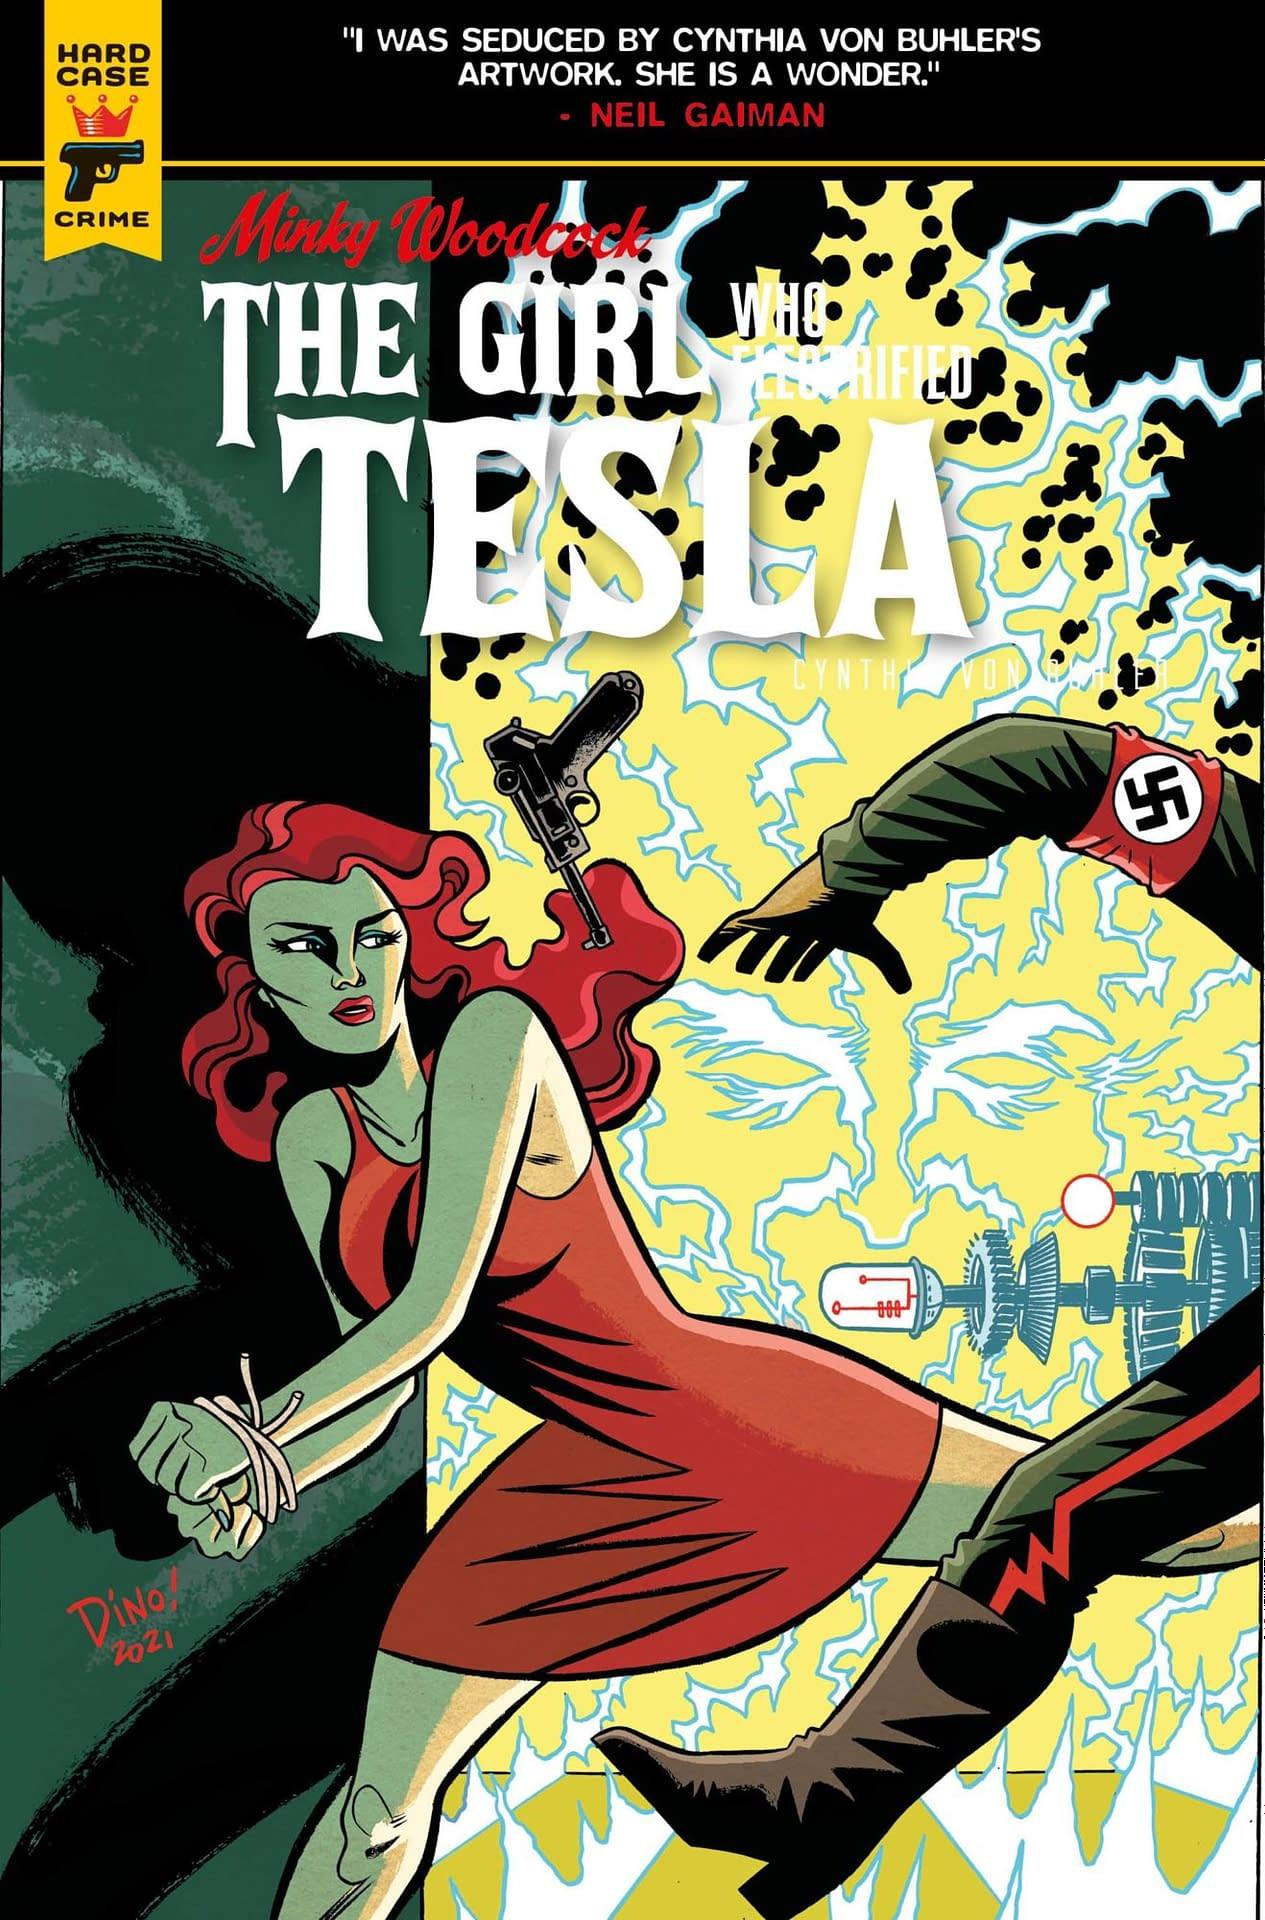 MINKY WOODCOCK GIRL ELECTRIFIED TESLA #4 CVR A HASPIEL (MR)